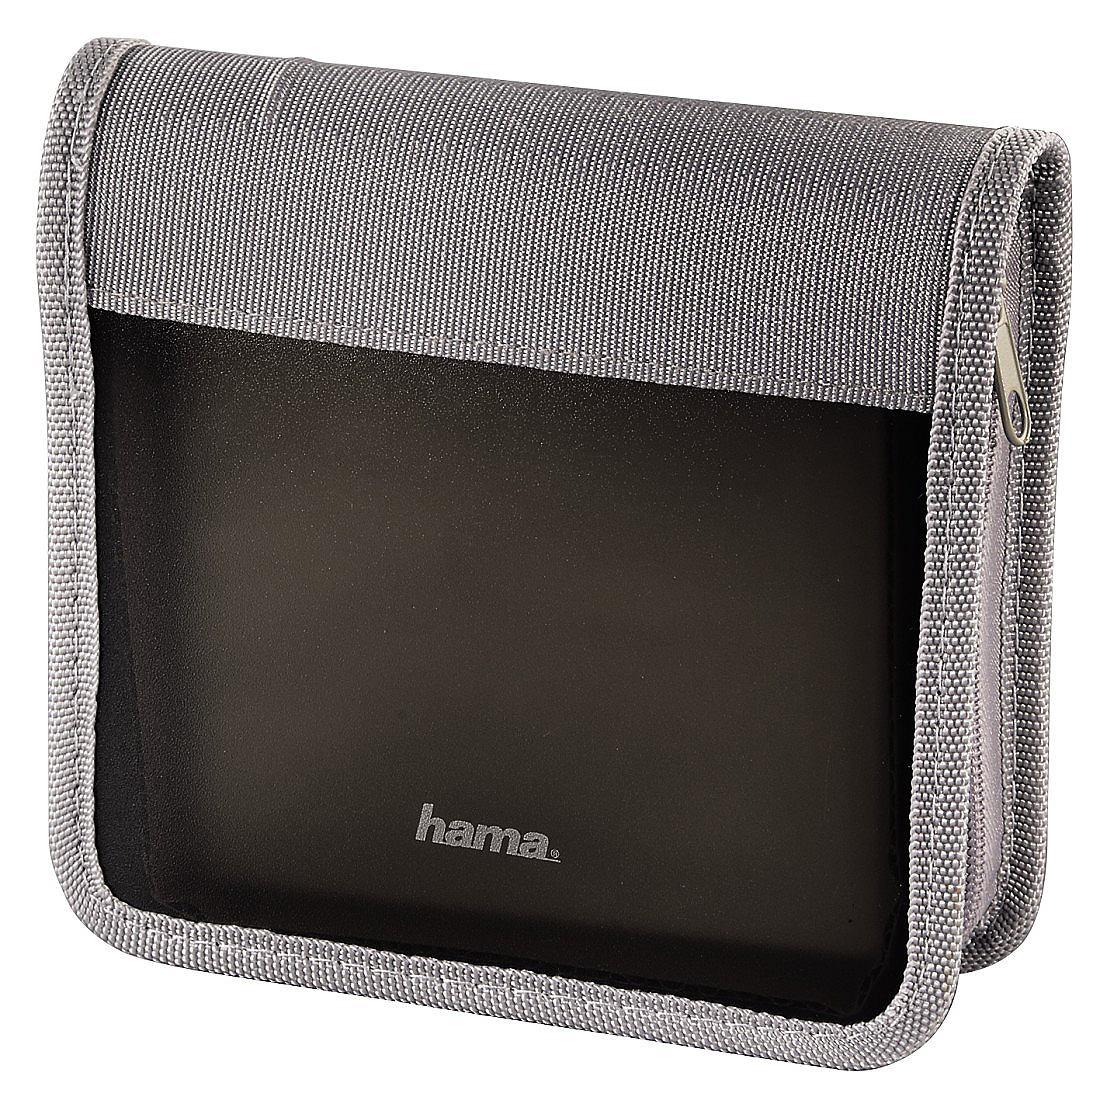 Hama HAMA CD-WALLET 28CD GRAPHITE